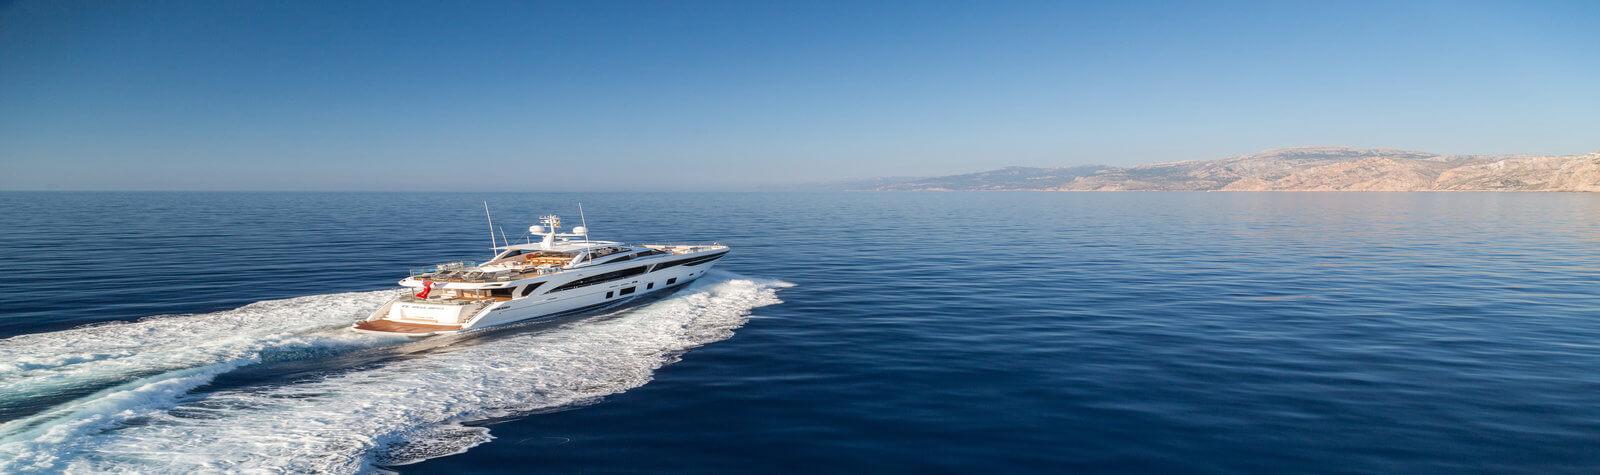 Mega yacht life